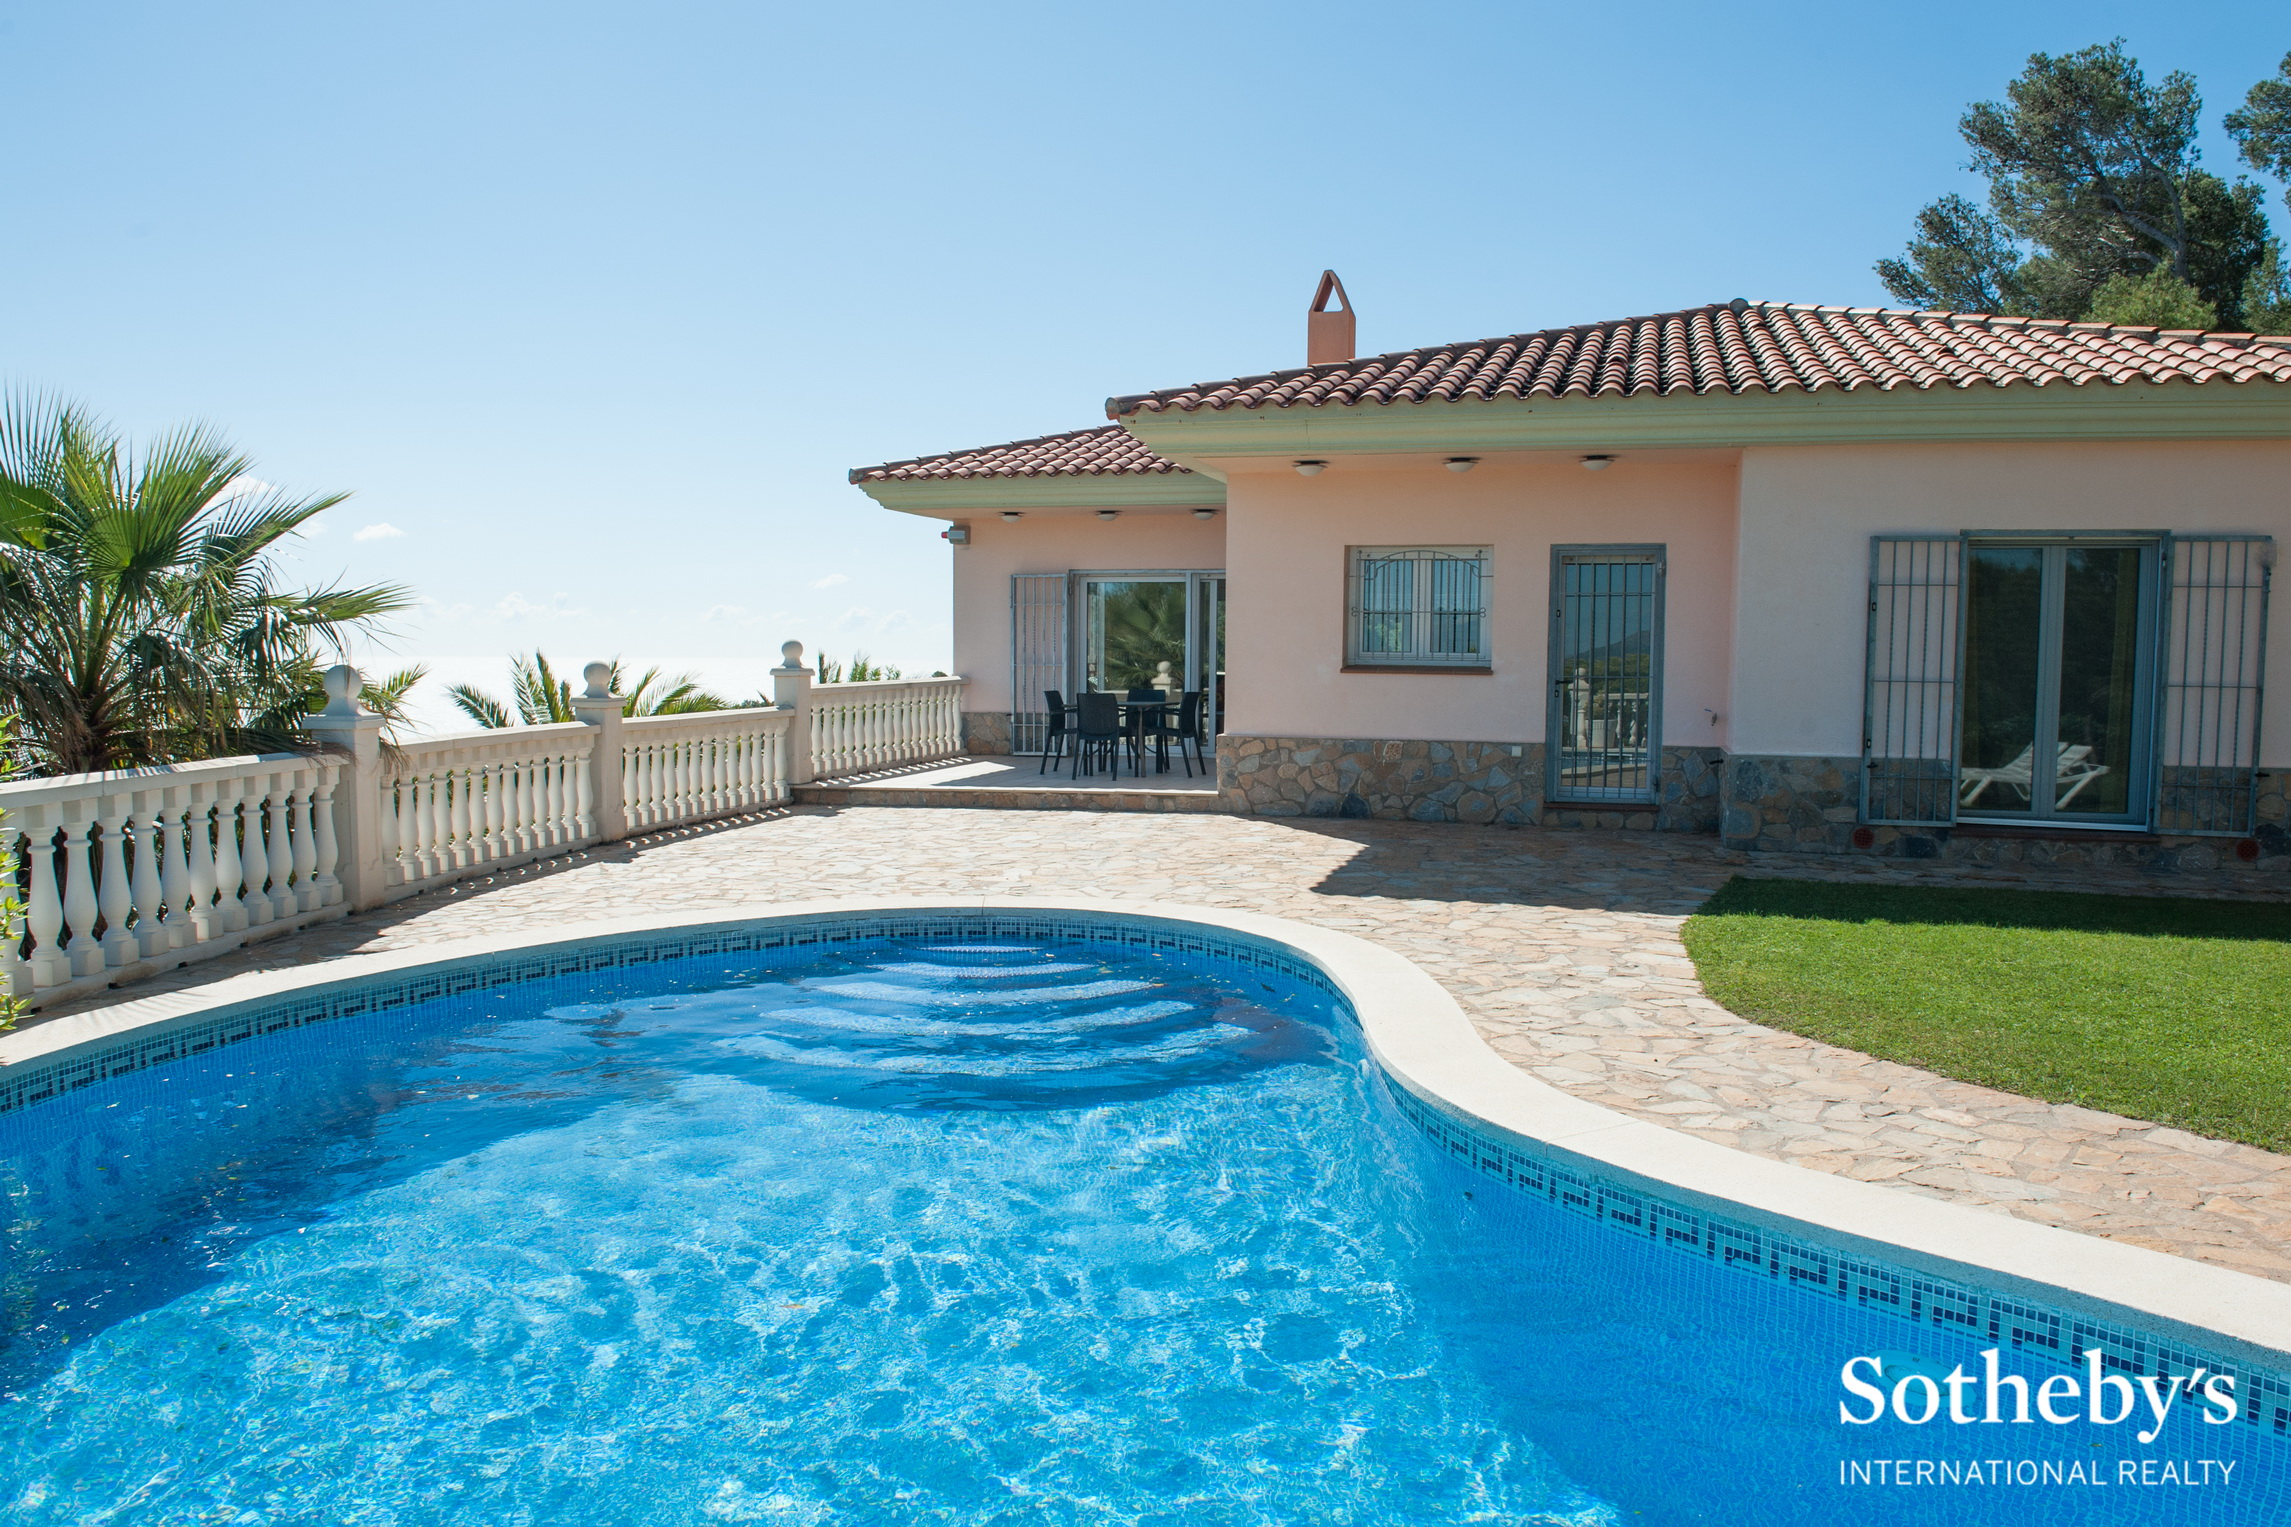 Nhà ở một gia đình vì Bán tại Mediterranean house with spectacular sea views Begur, Costa Brava 17255 Tây Ban Nha